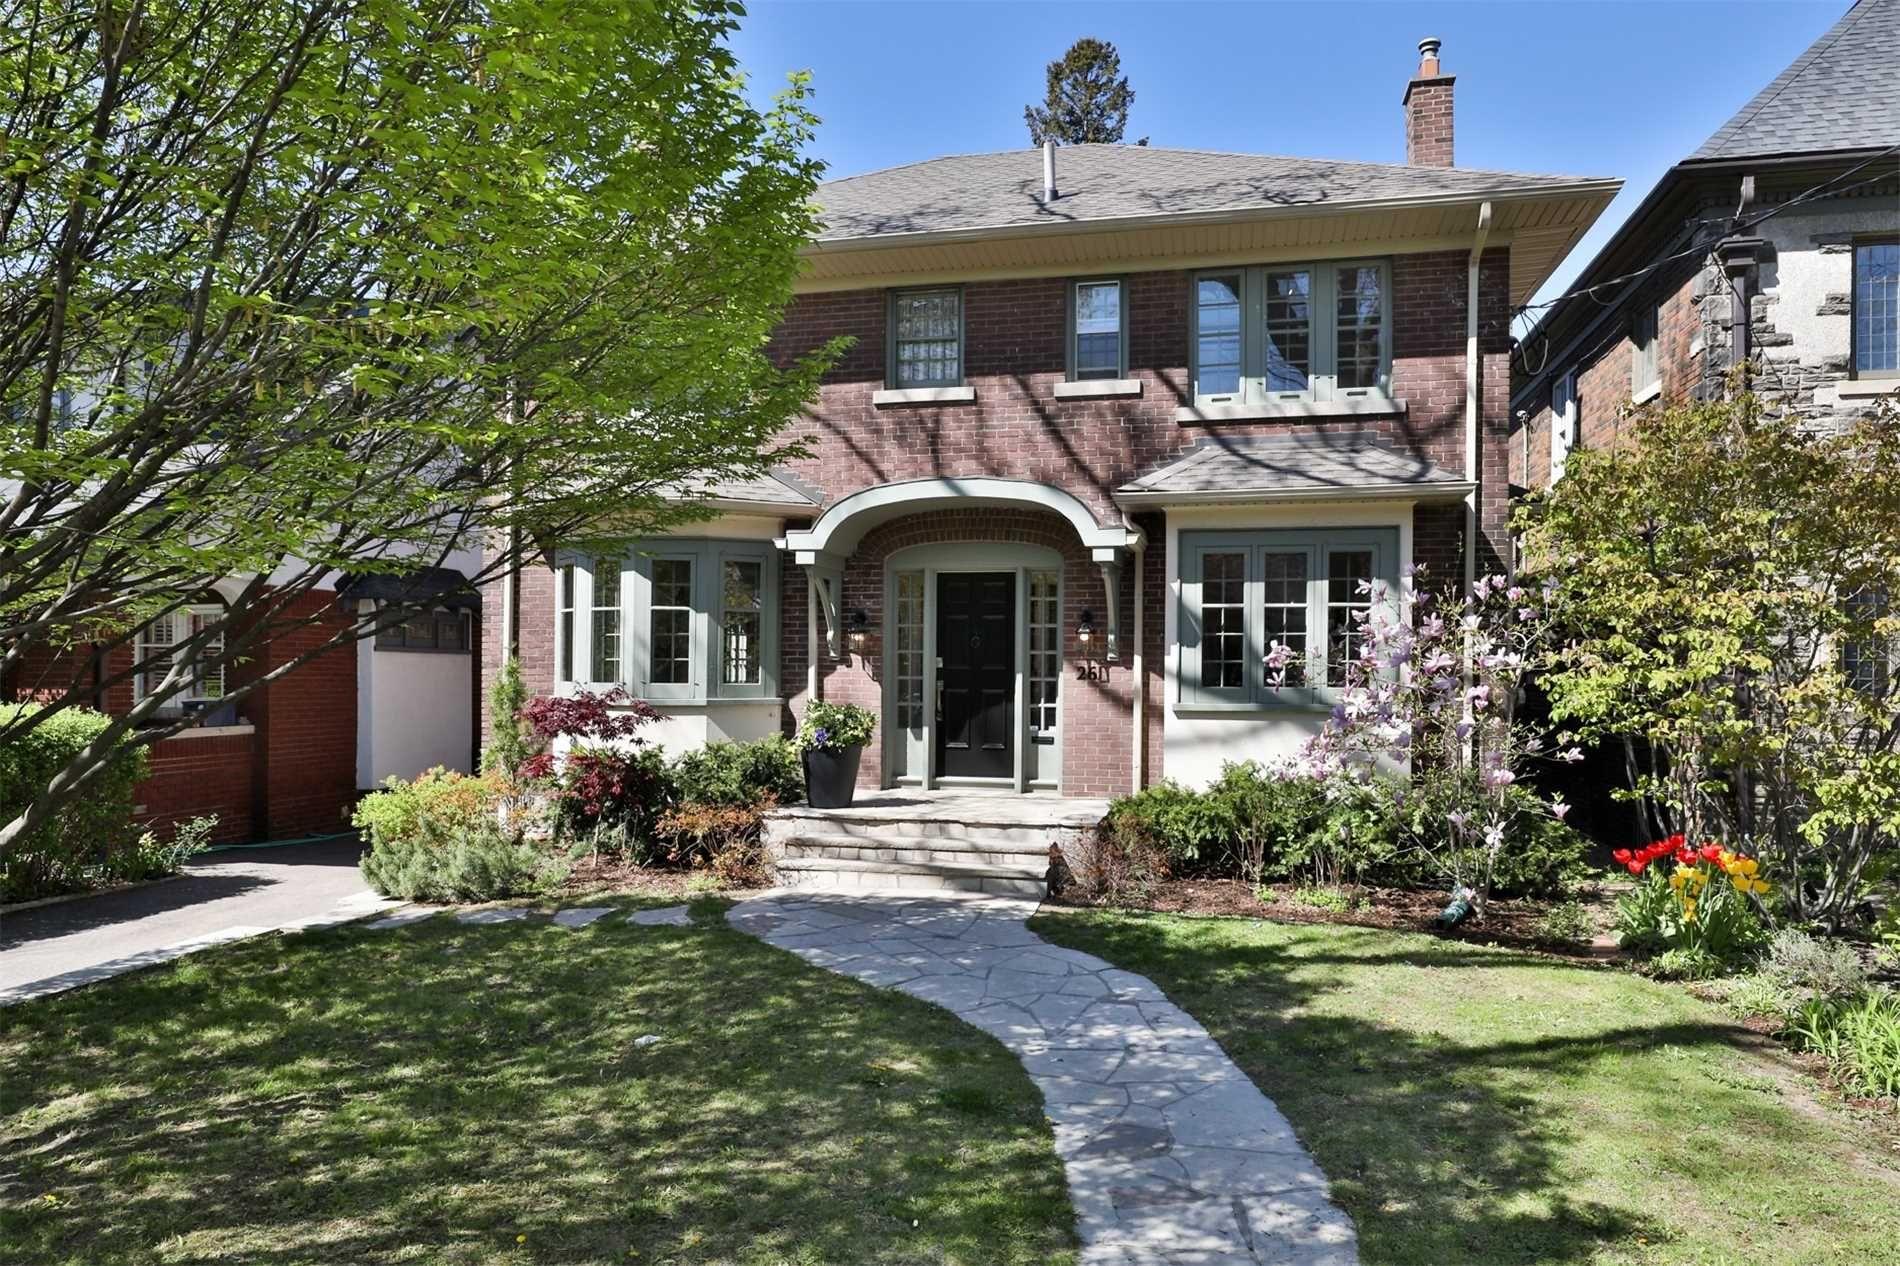 Main Photo: 42 Turner Road in Toronto: Wychwood Freehold for sale (Toronto C02)  : MLS®# c5237561